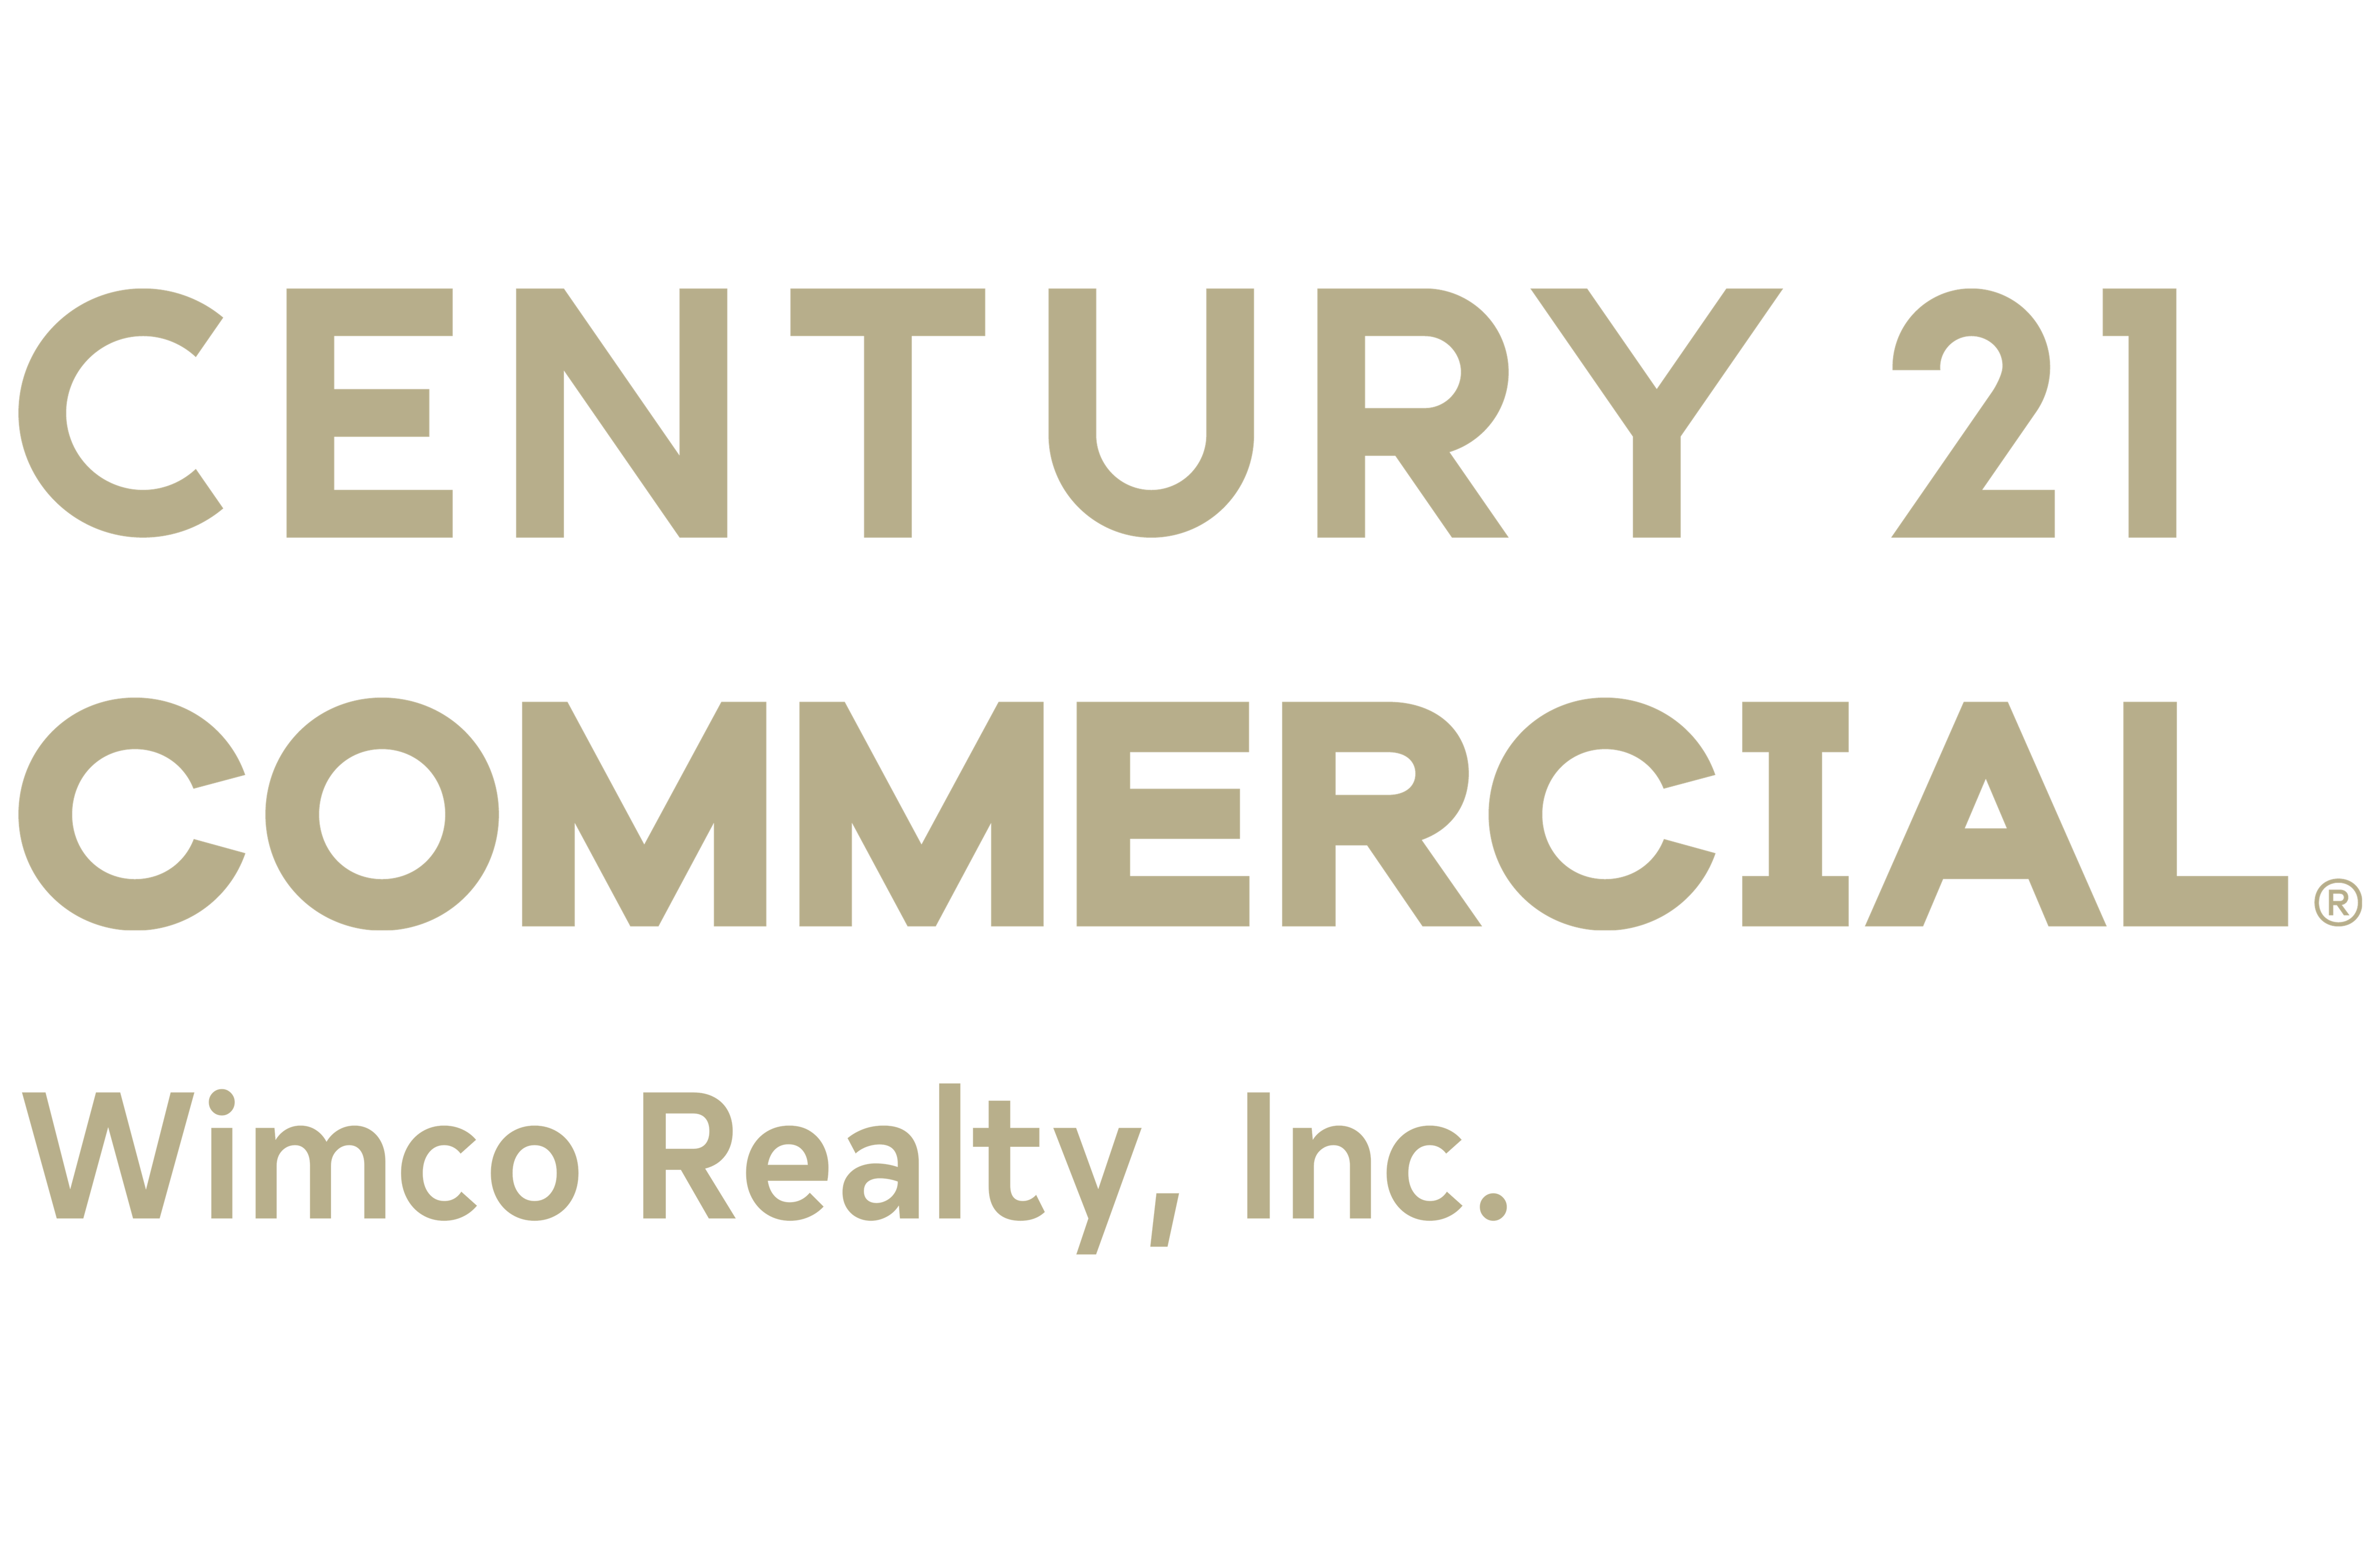 Michael P. Cadogan of CENTURY 21 Wimco Realty, Inc. logo